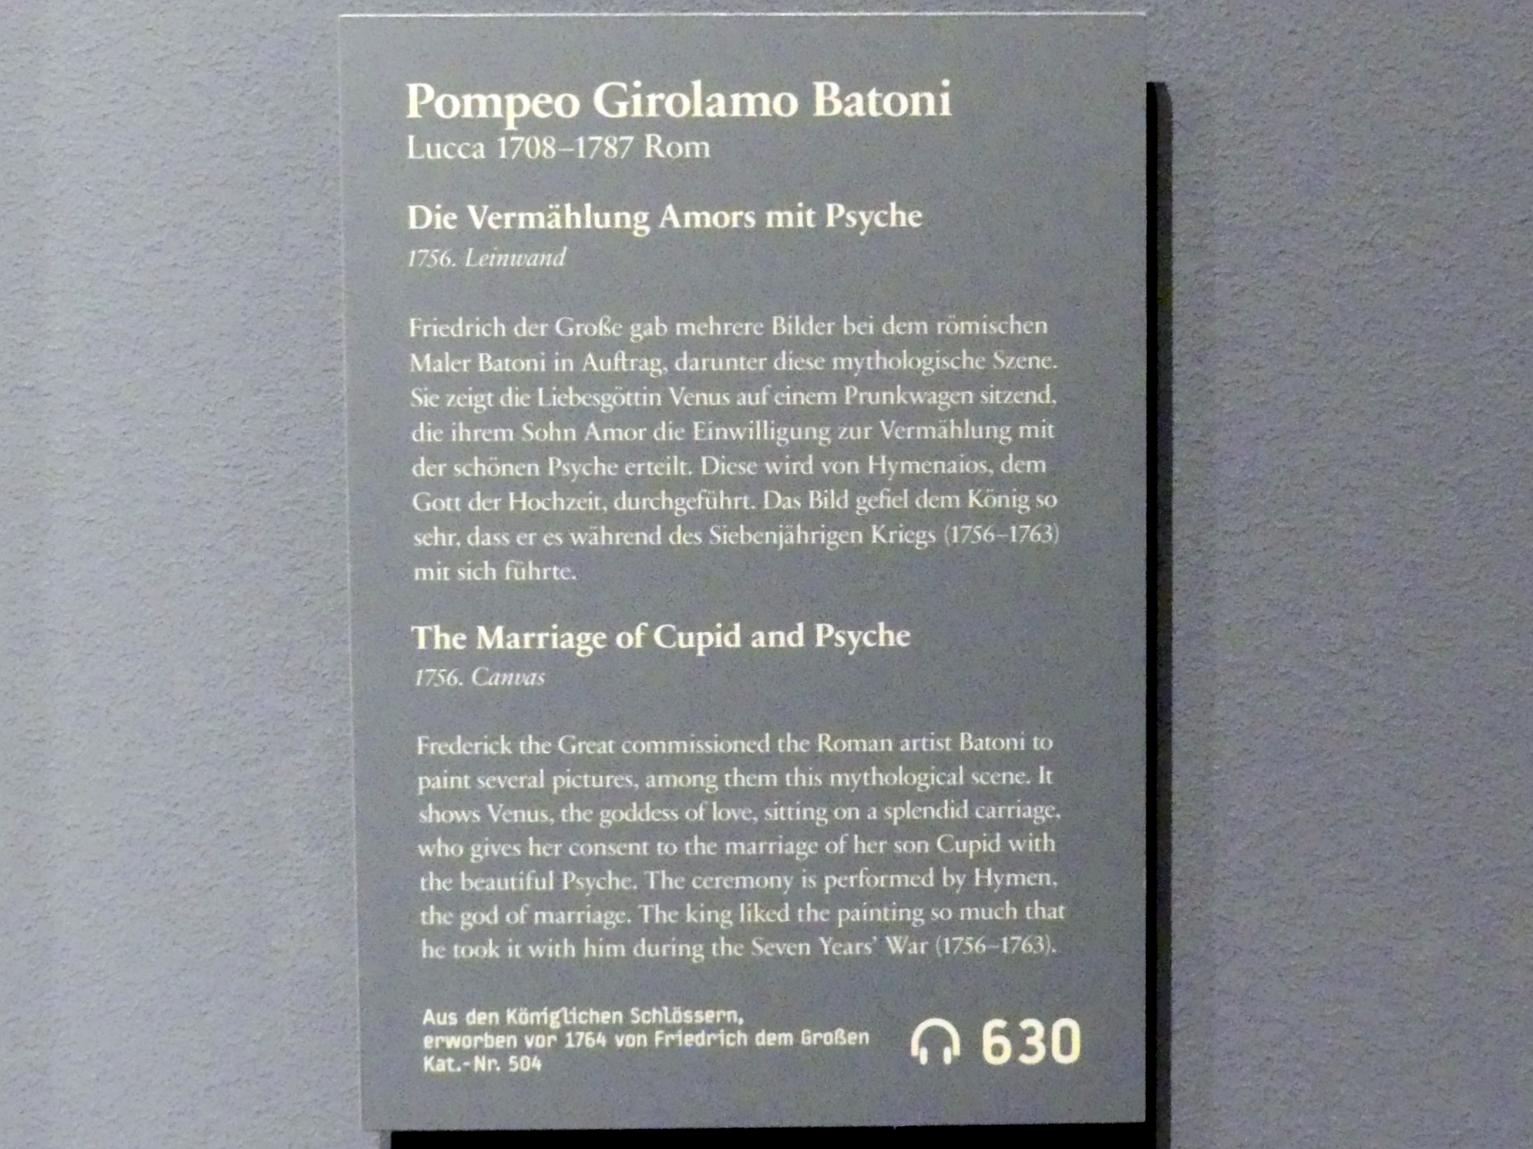 Pompeo Girolamo Batoni: Die Vermählung Amors mit Psyche, 1756, Bild 2/2